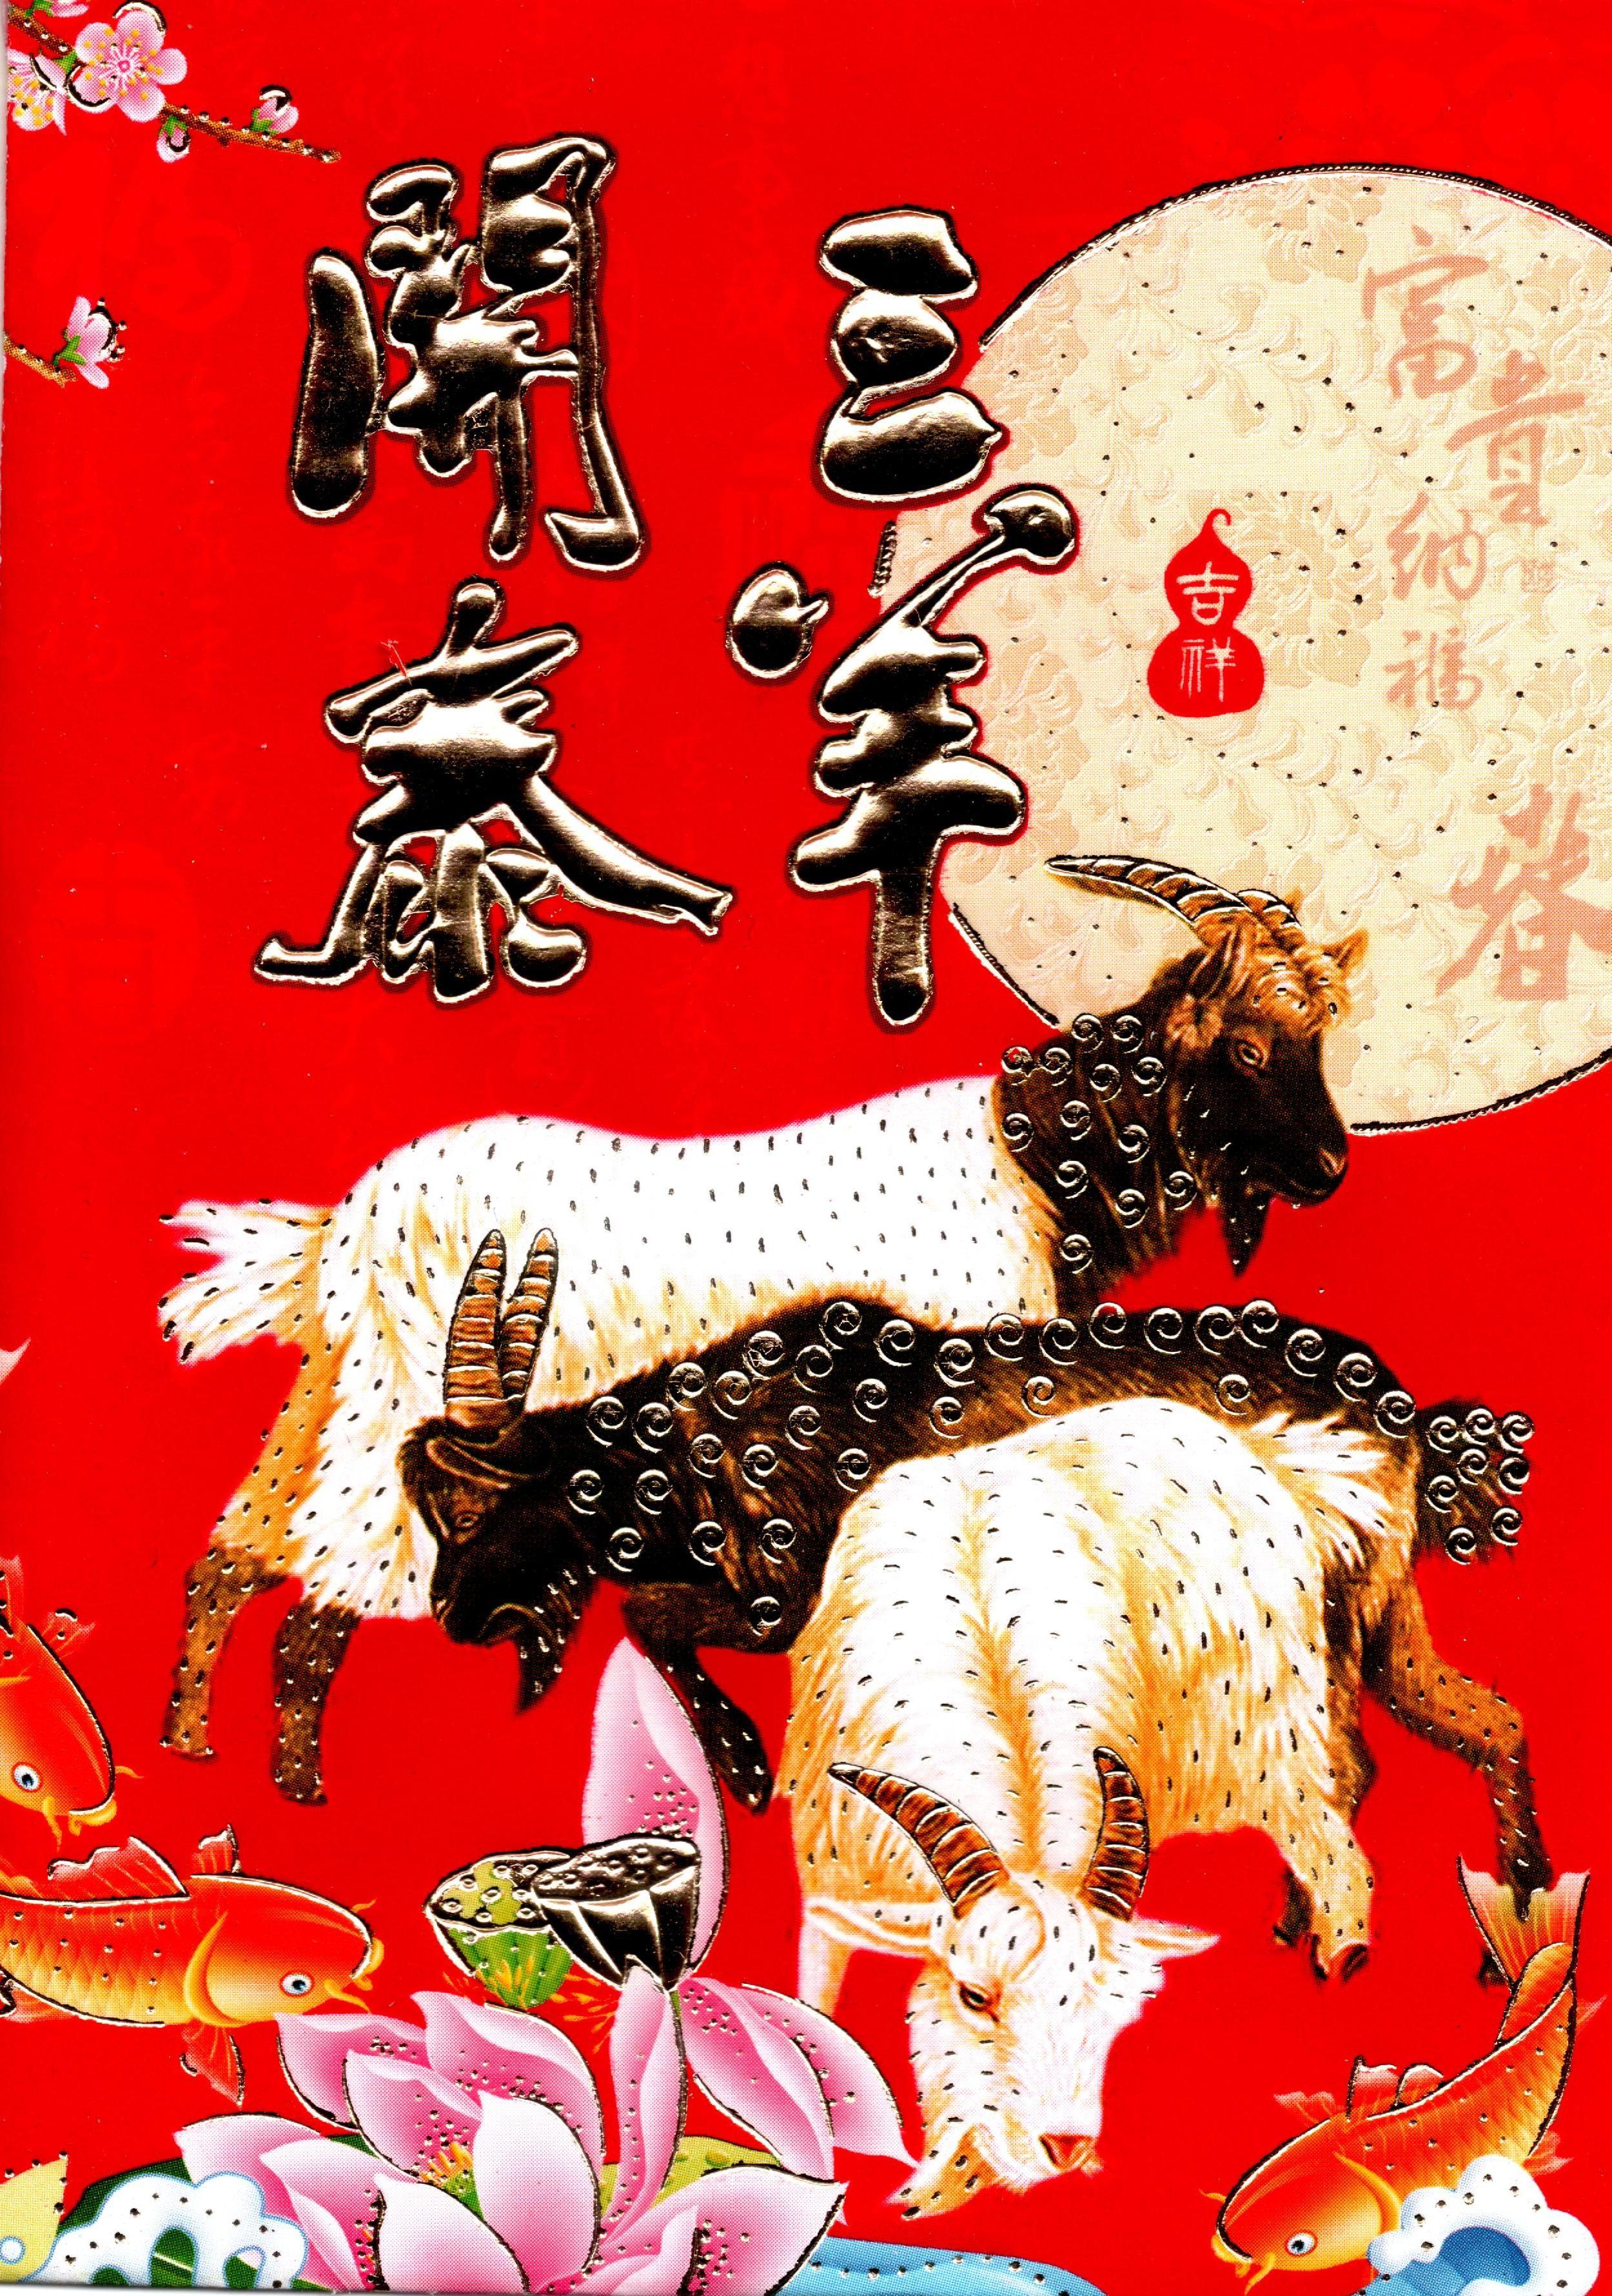 13+ Horoscopo chino que animal soy ideas in 2021